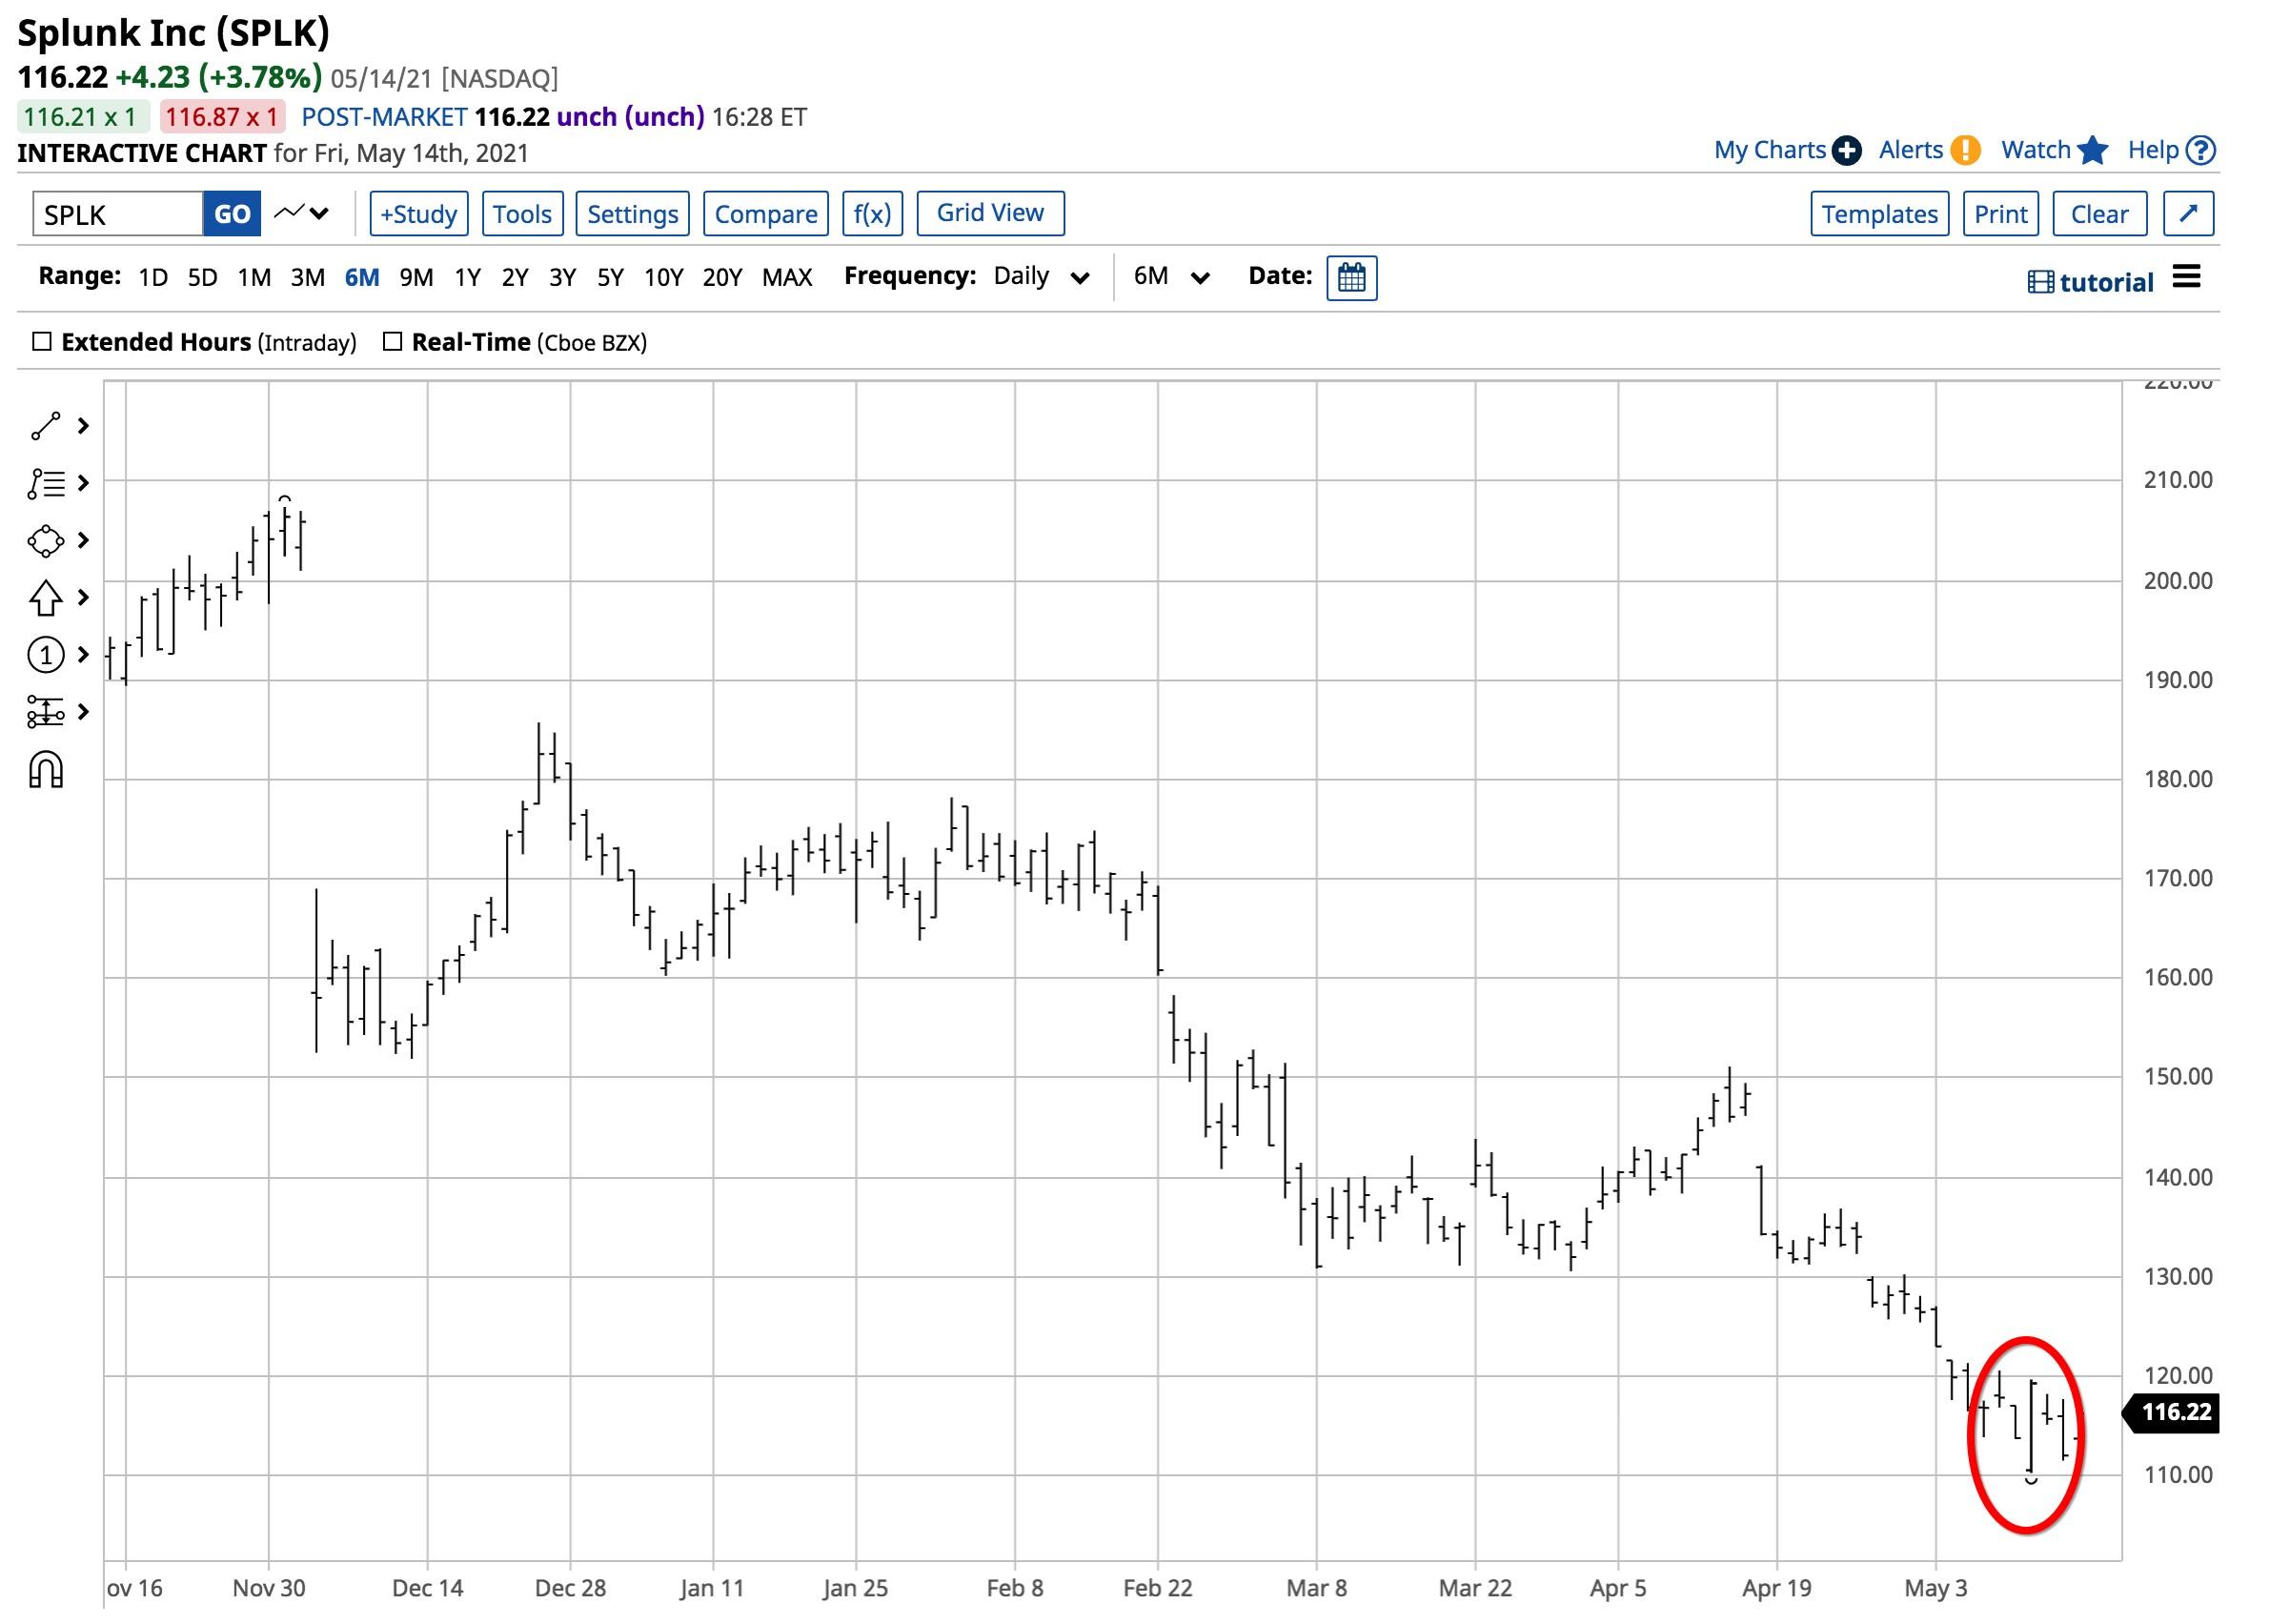 SPLK Price Chart 5 18 21